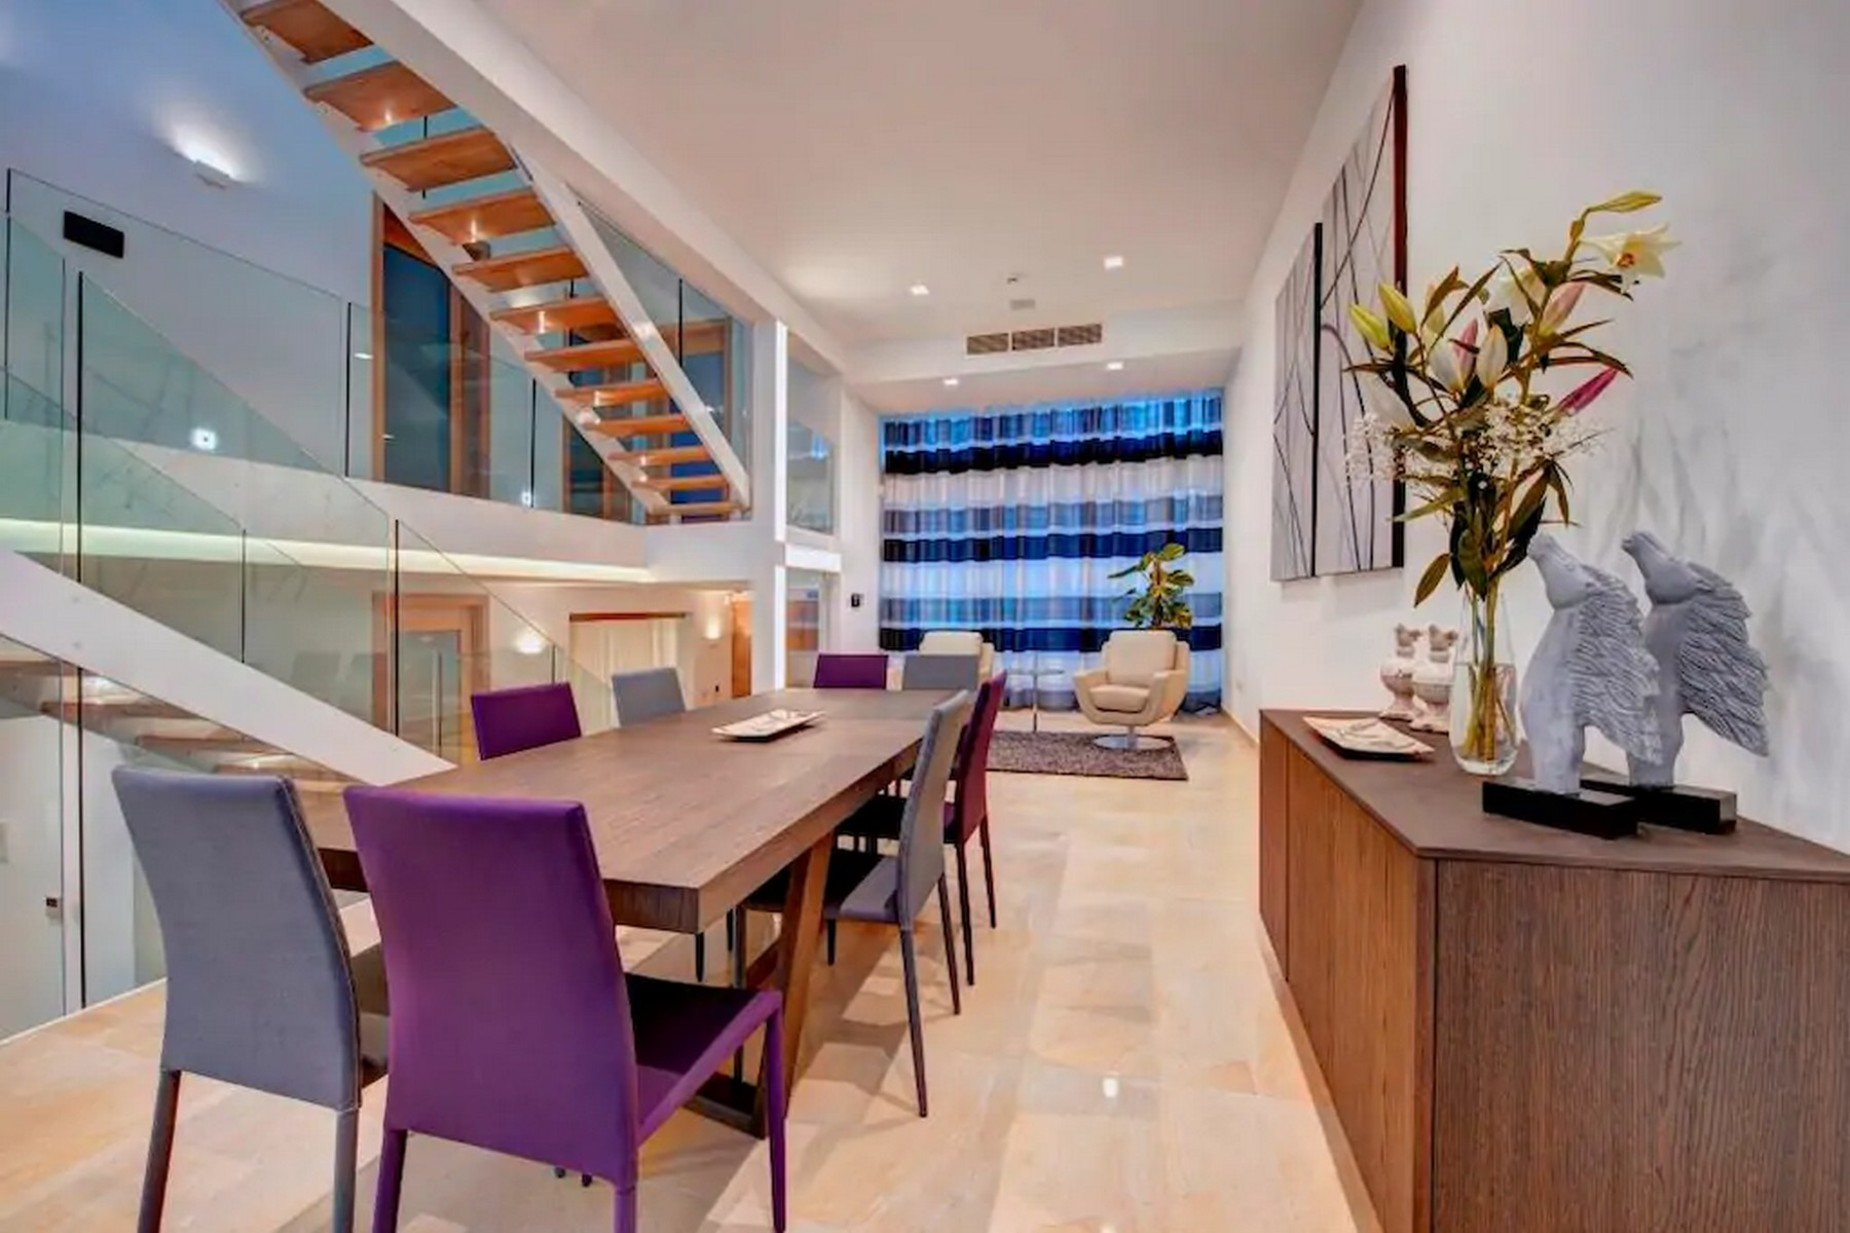 3 bed Villa For Rent in Iklin, Iklin - thumb 11